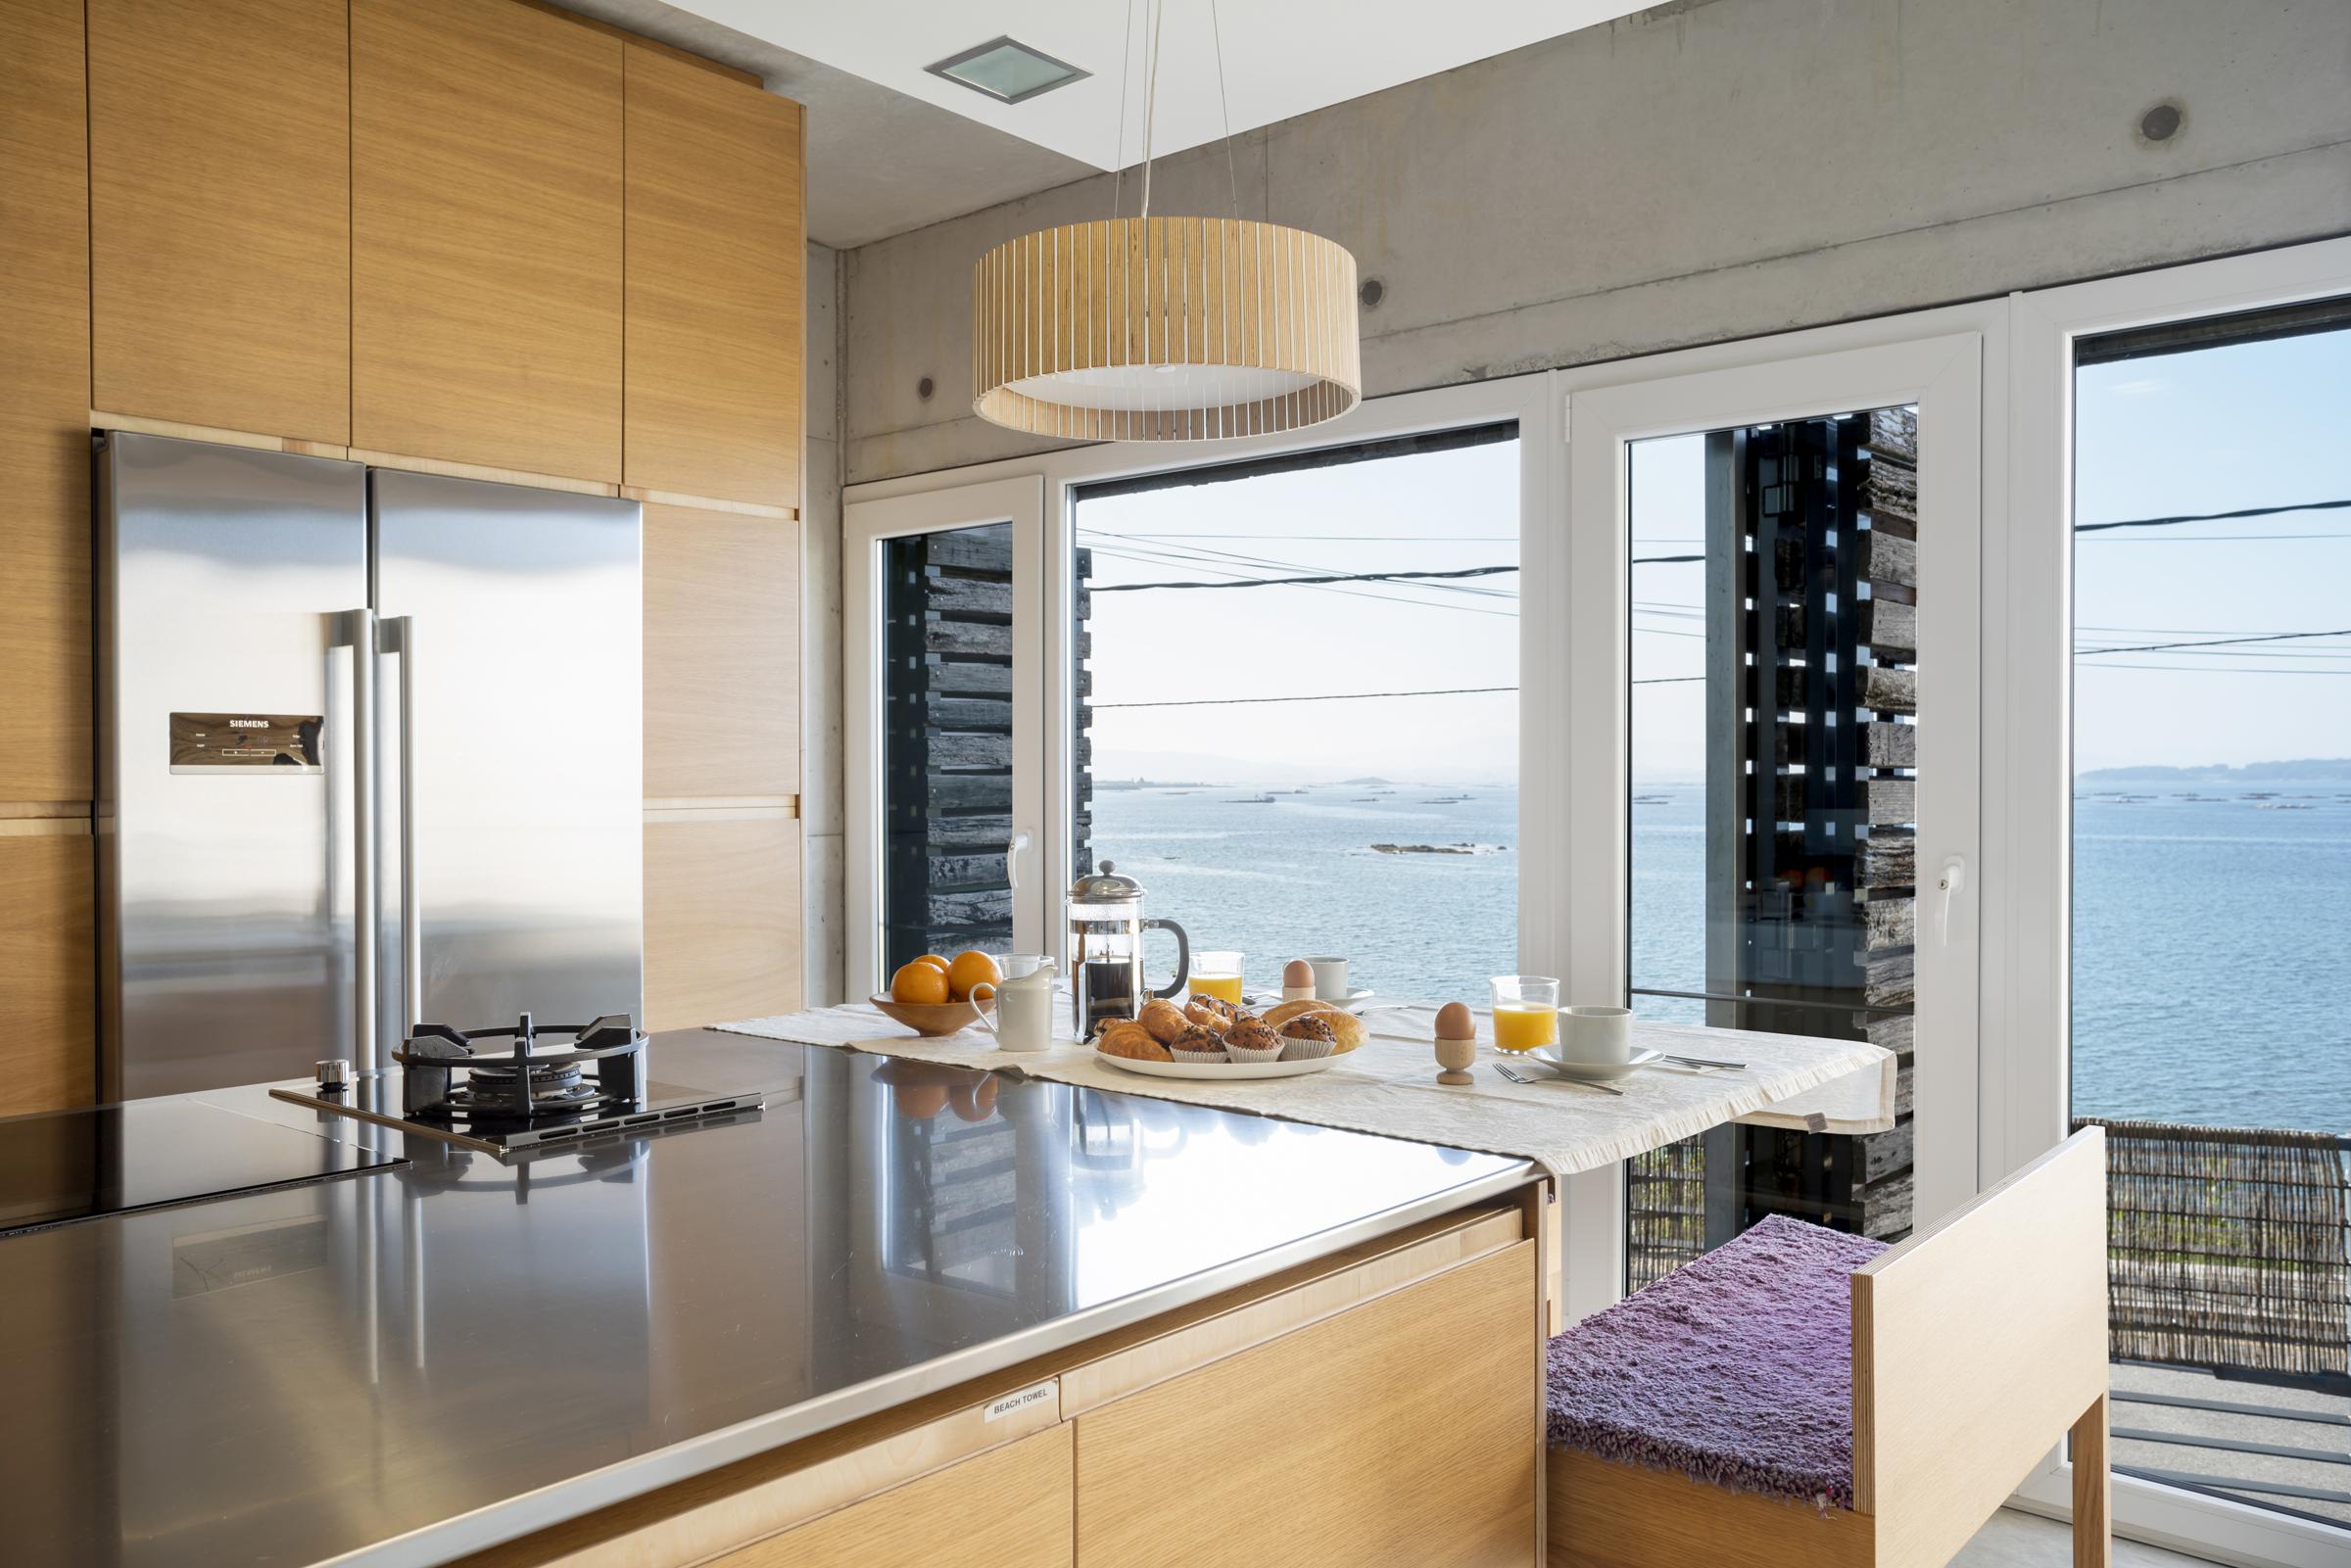 dezanove-house-luxury-villa-galicia-kitchen-2